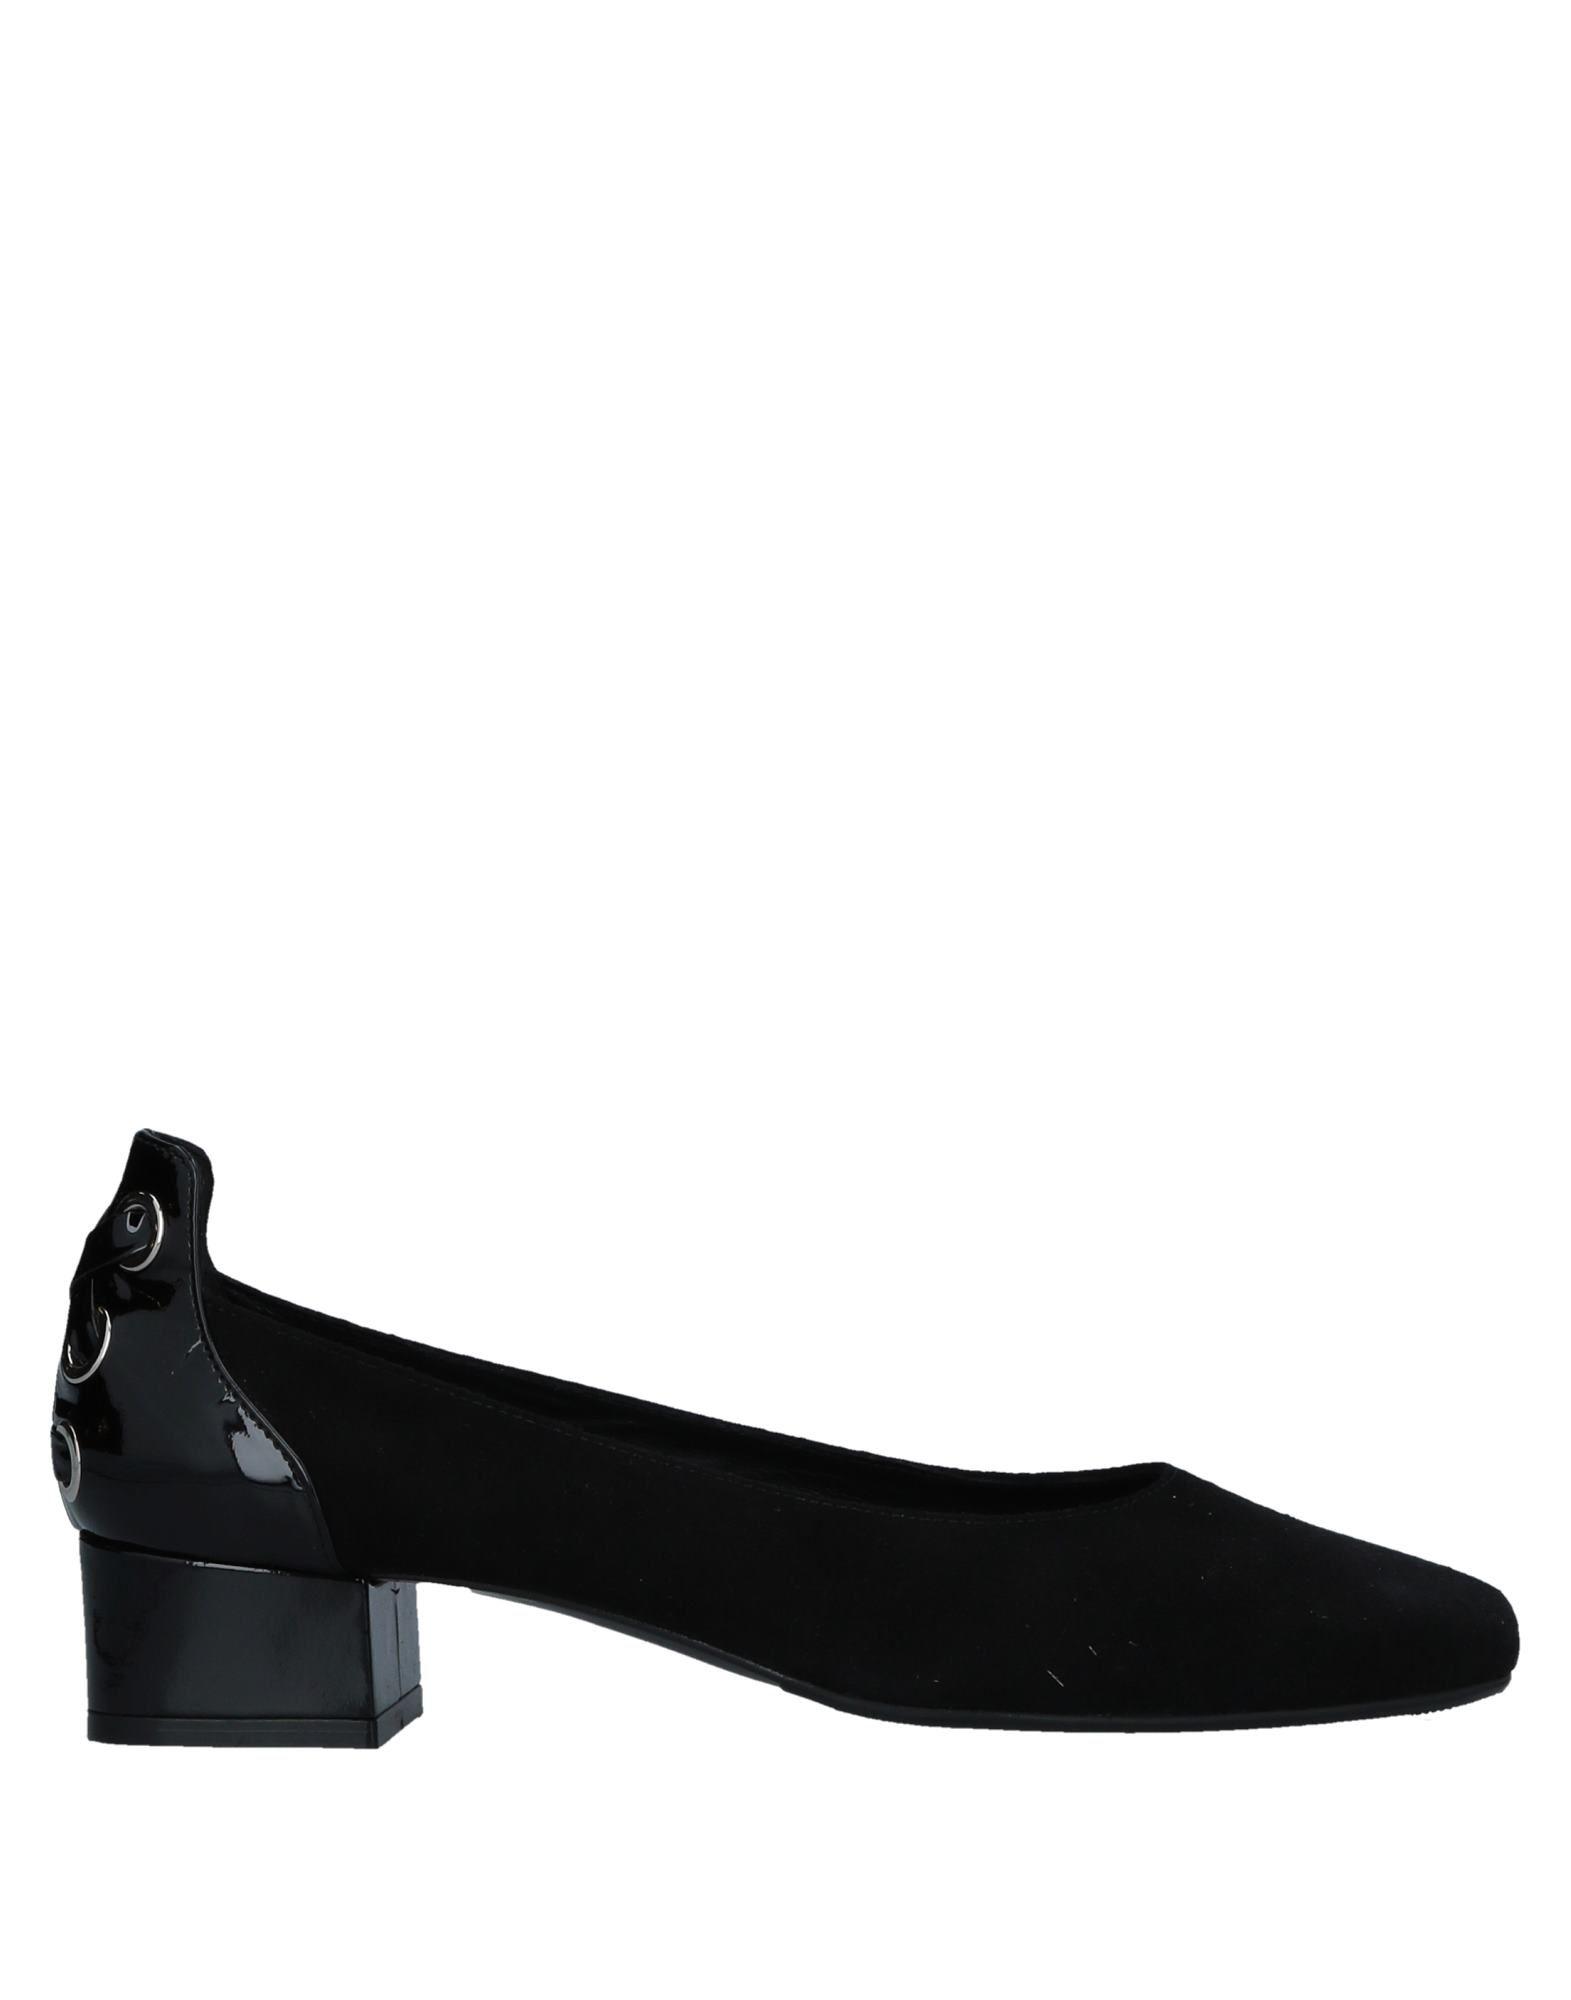 La Sellerie Pumps Damen  11531931XL Gute Qualität beliebte Schuhe